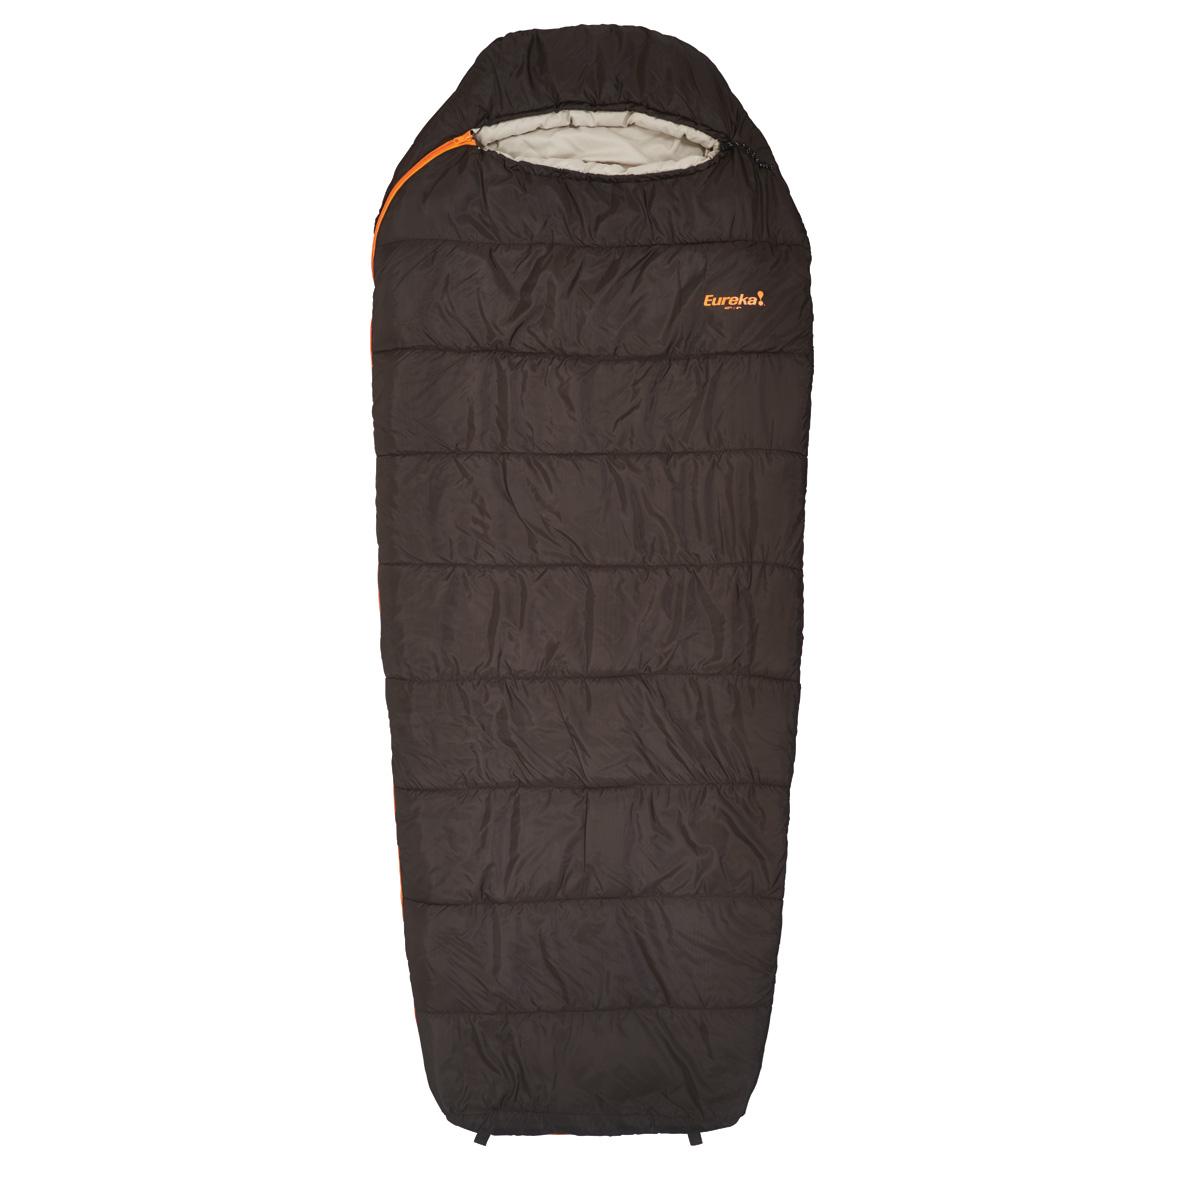 Eureka! Lone Pine 40 Degree Sleeping Bag - Wildland Warehouse | Gear for Wildland Fire